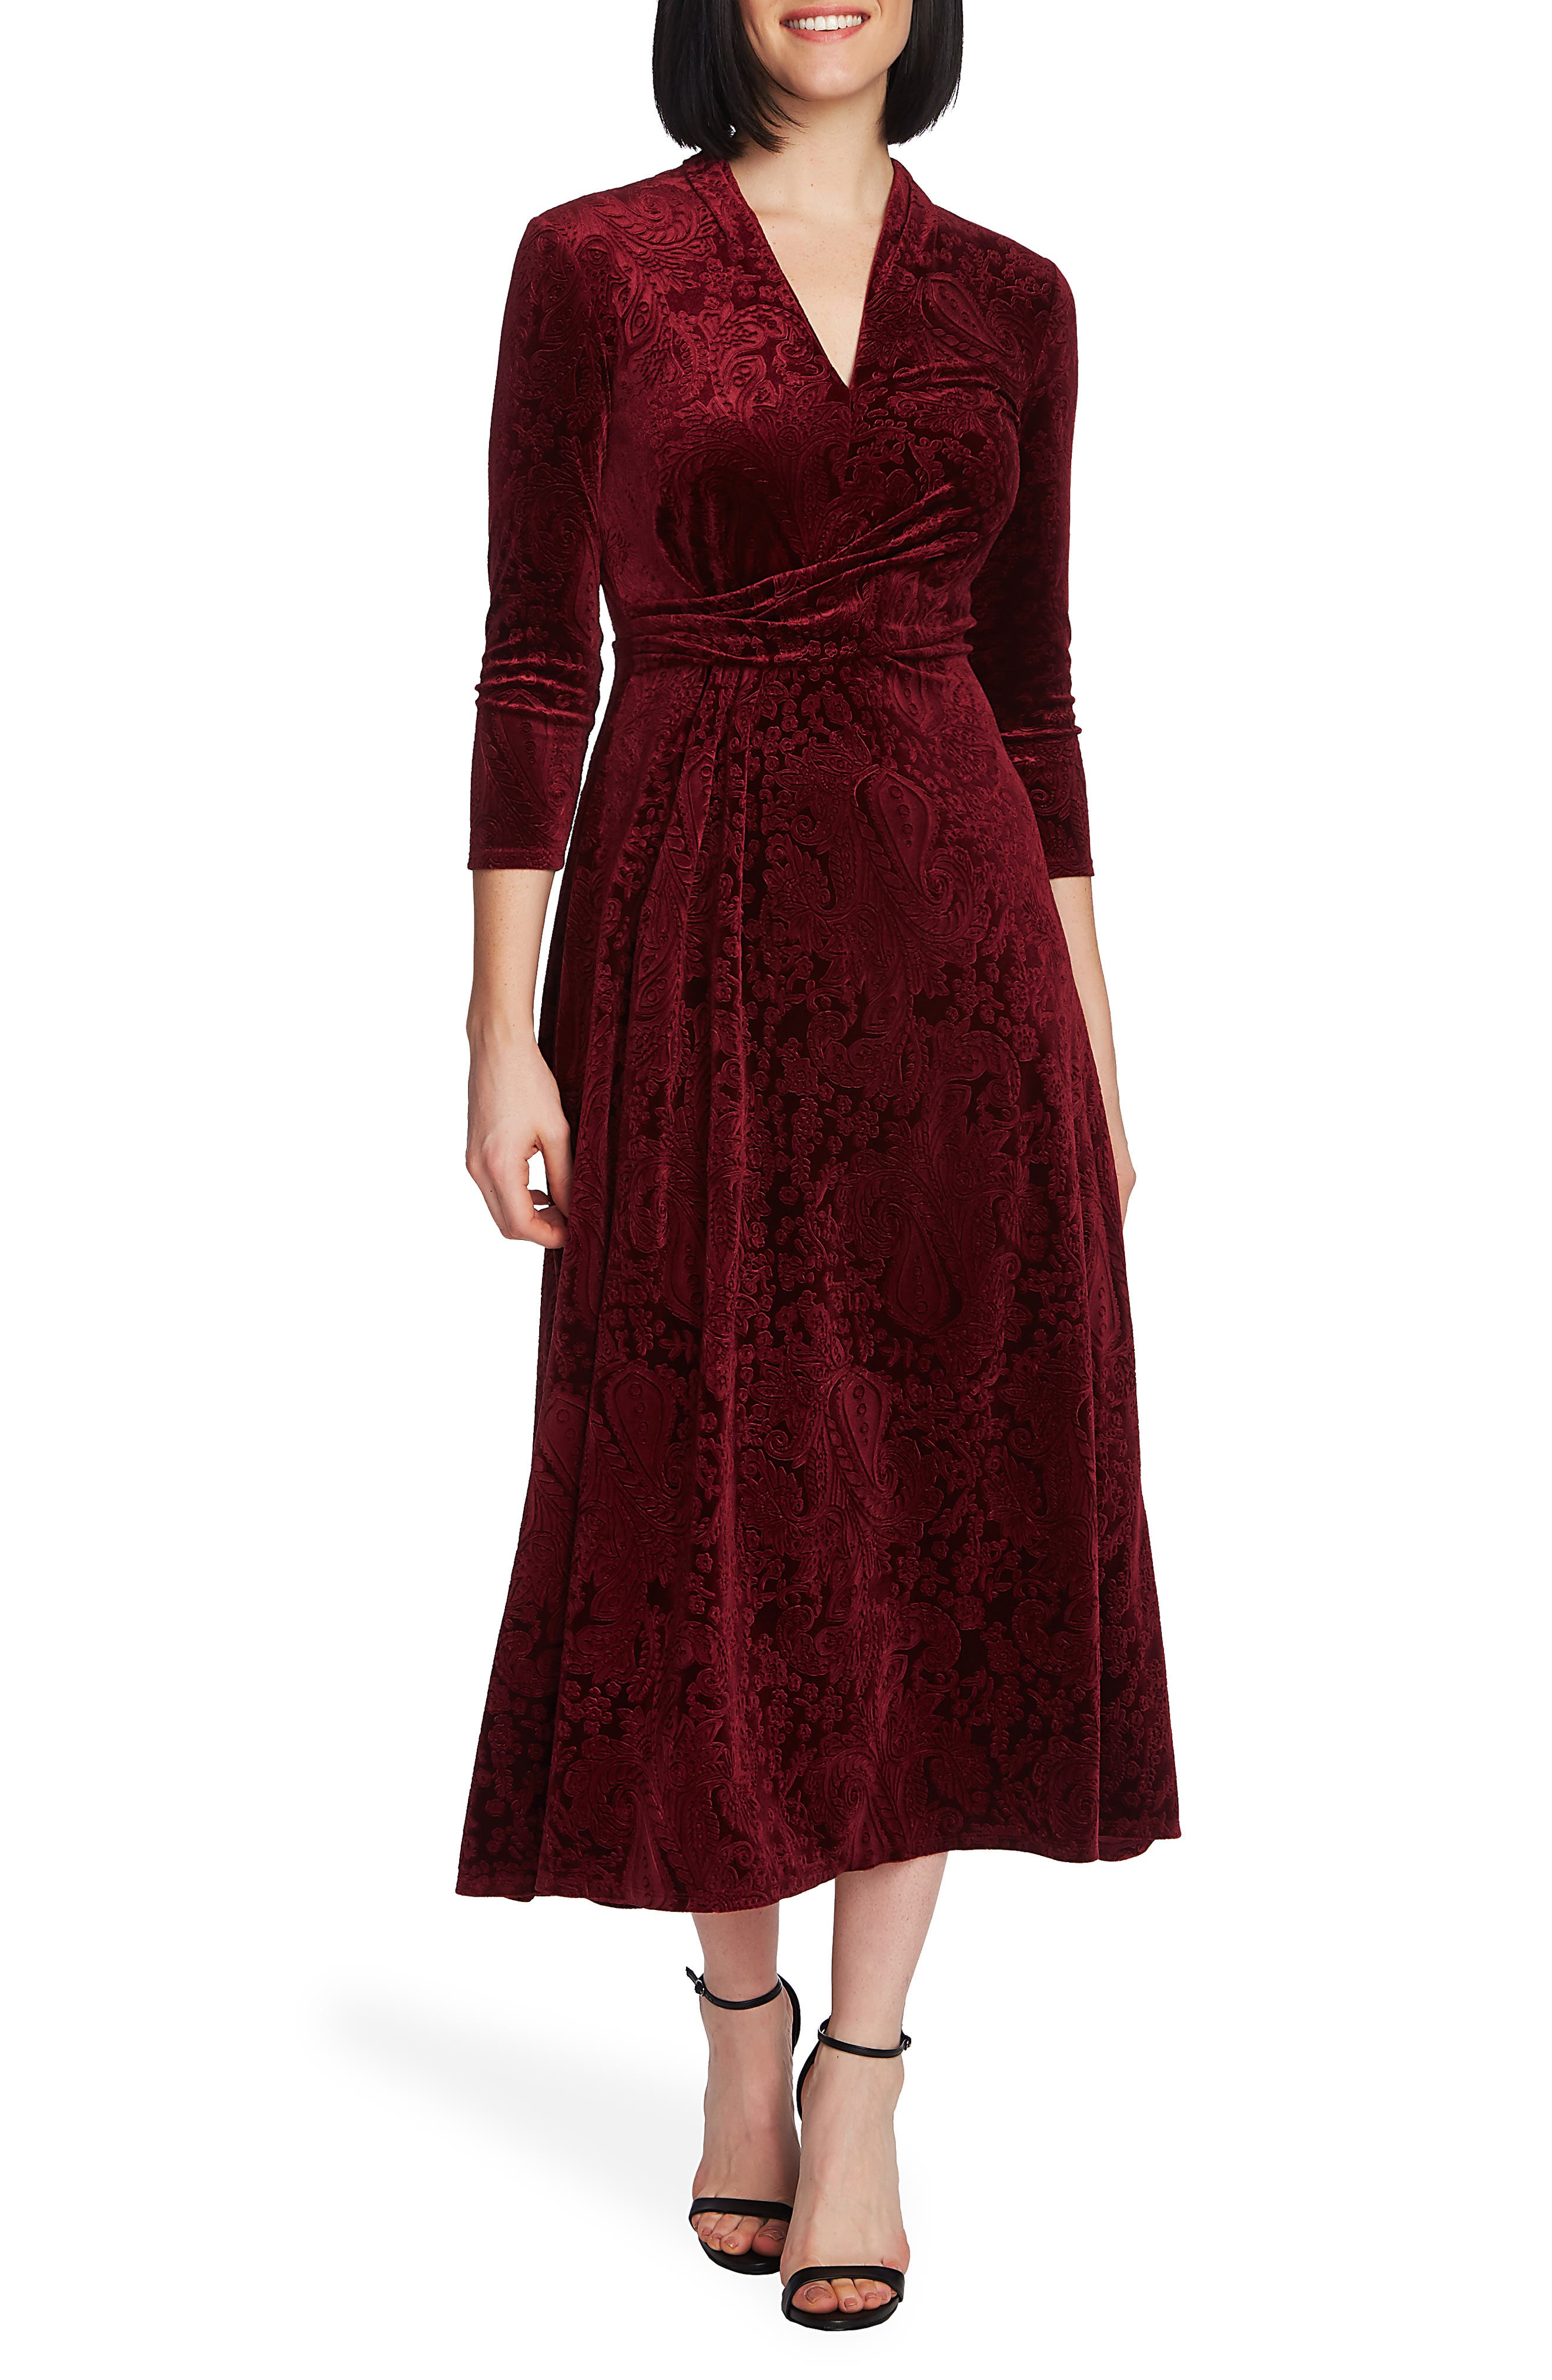 1940s Cocktail Dresses, Party Dresses Womens Chaus Paisley Velvet Midi Dress $99.00 AT vintagedancer.com